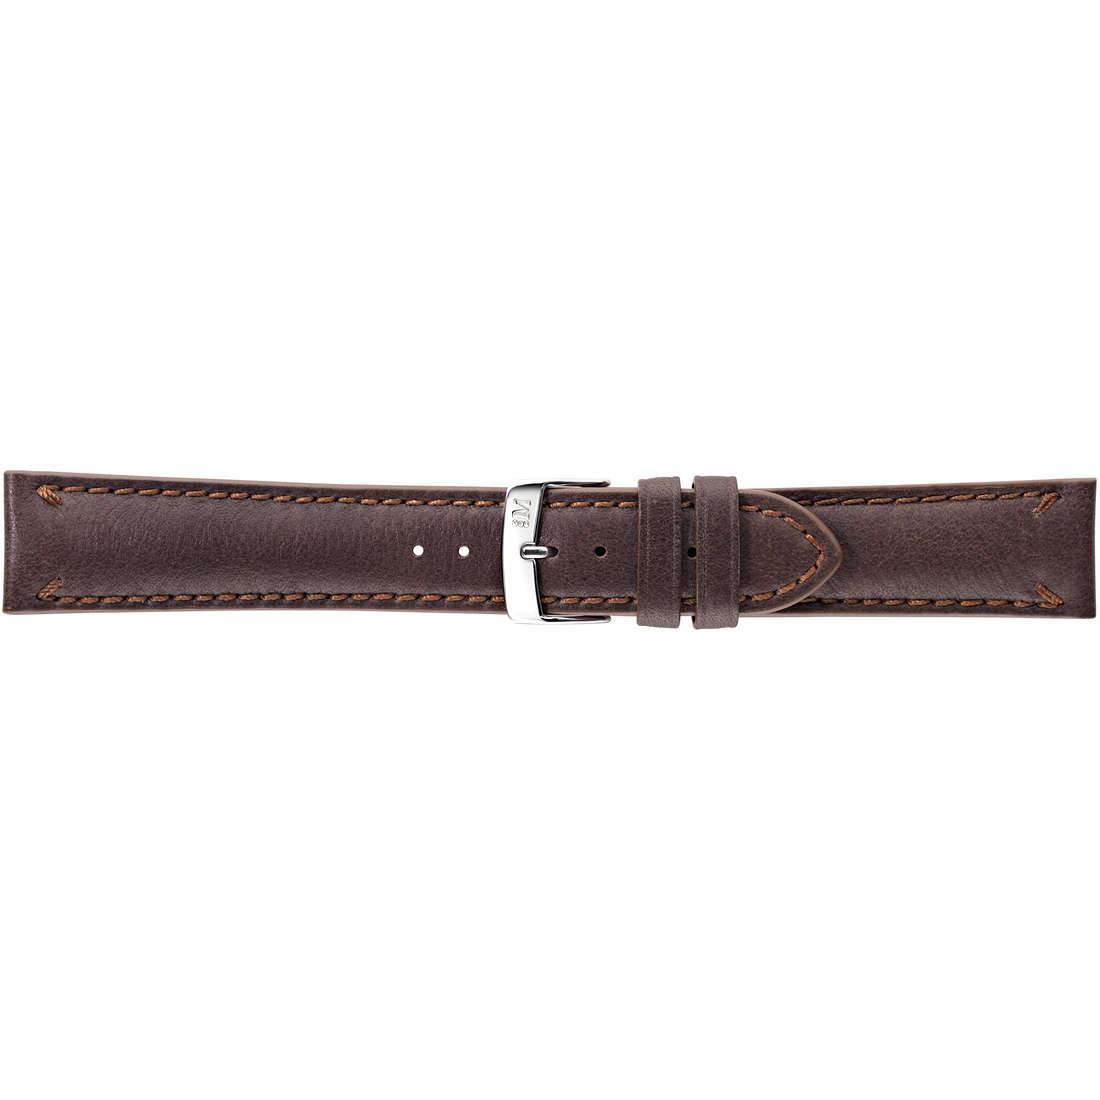 montre bande de montres homme Morellato Manufatti A01X4540A61030CR18